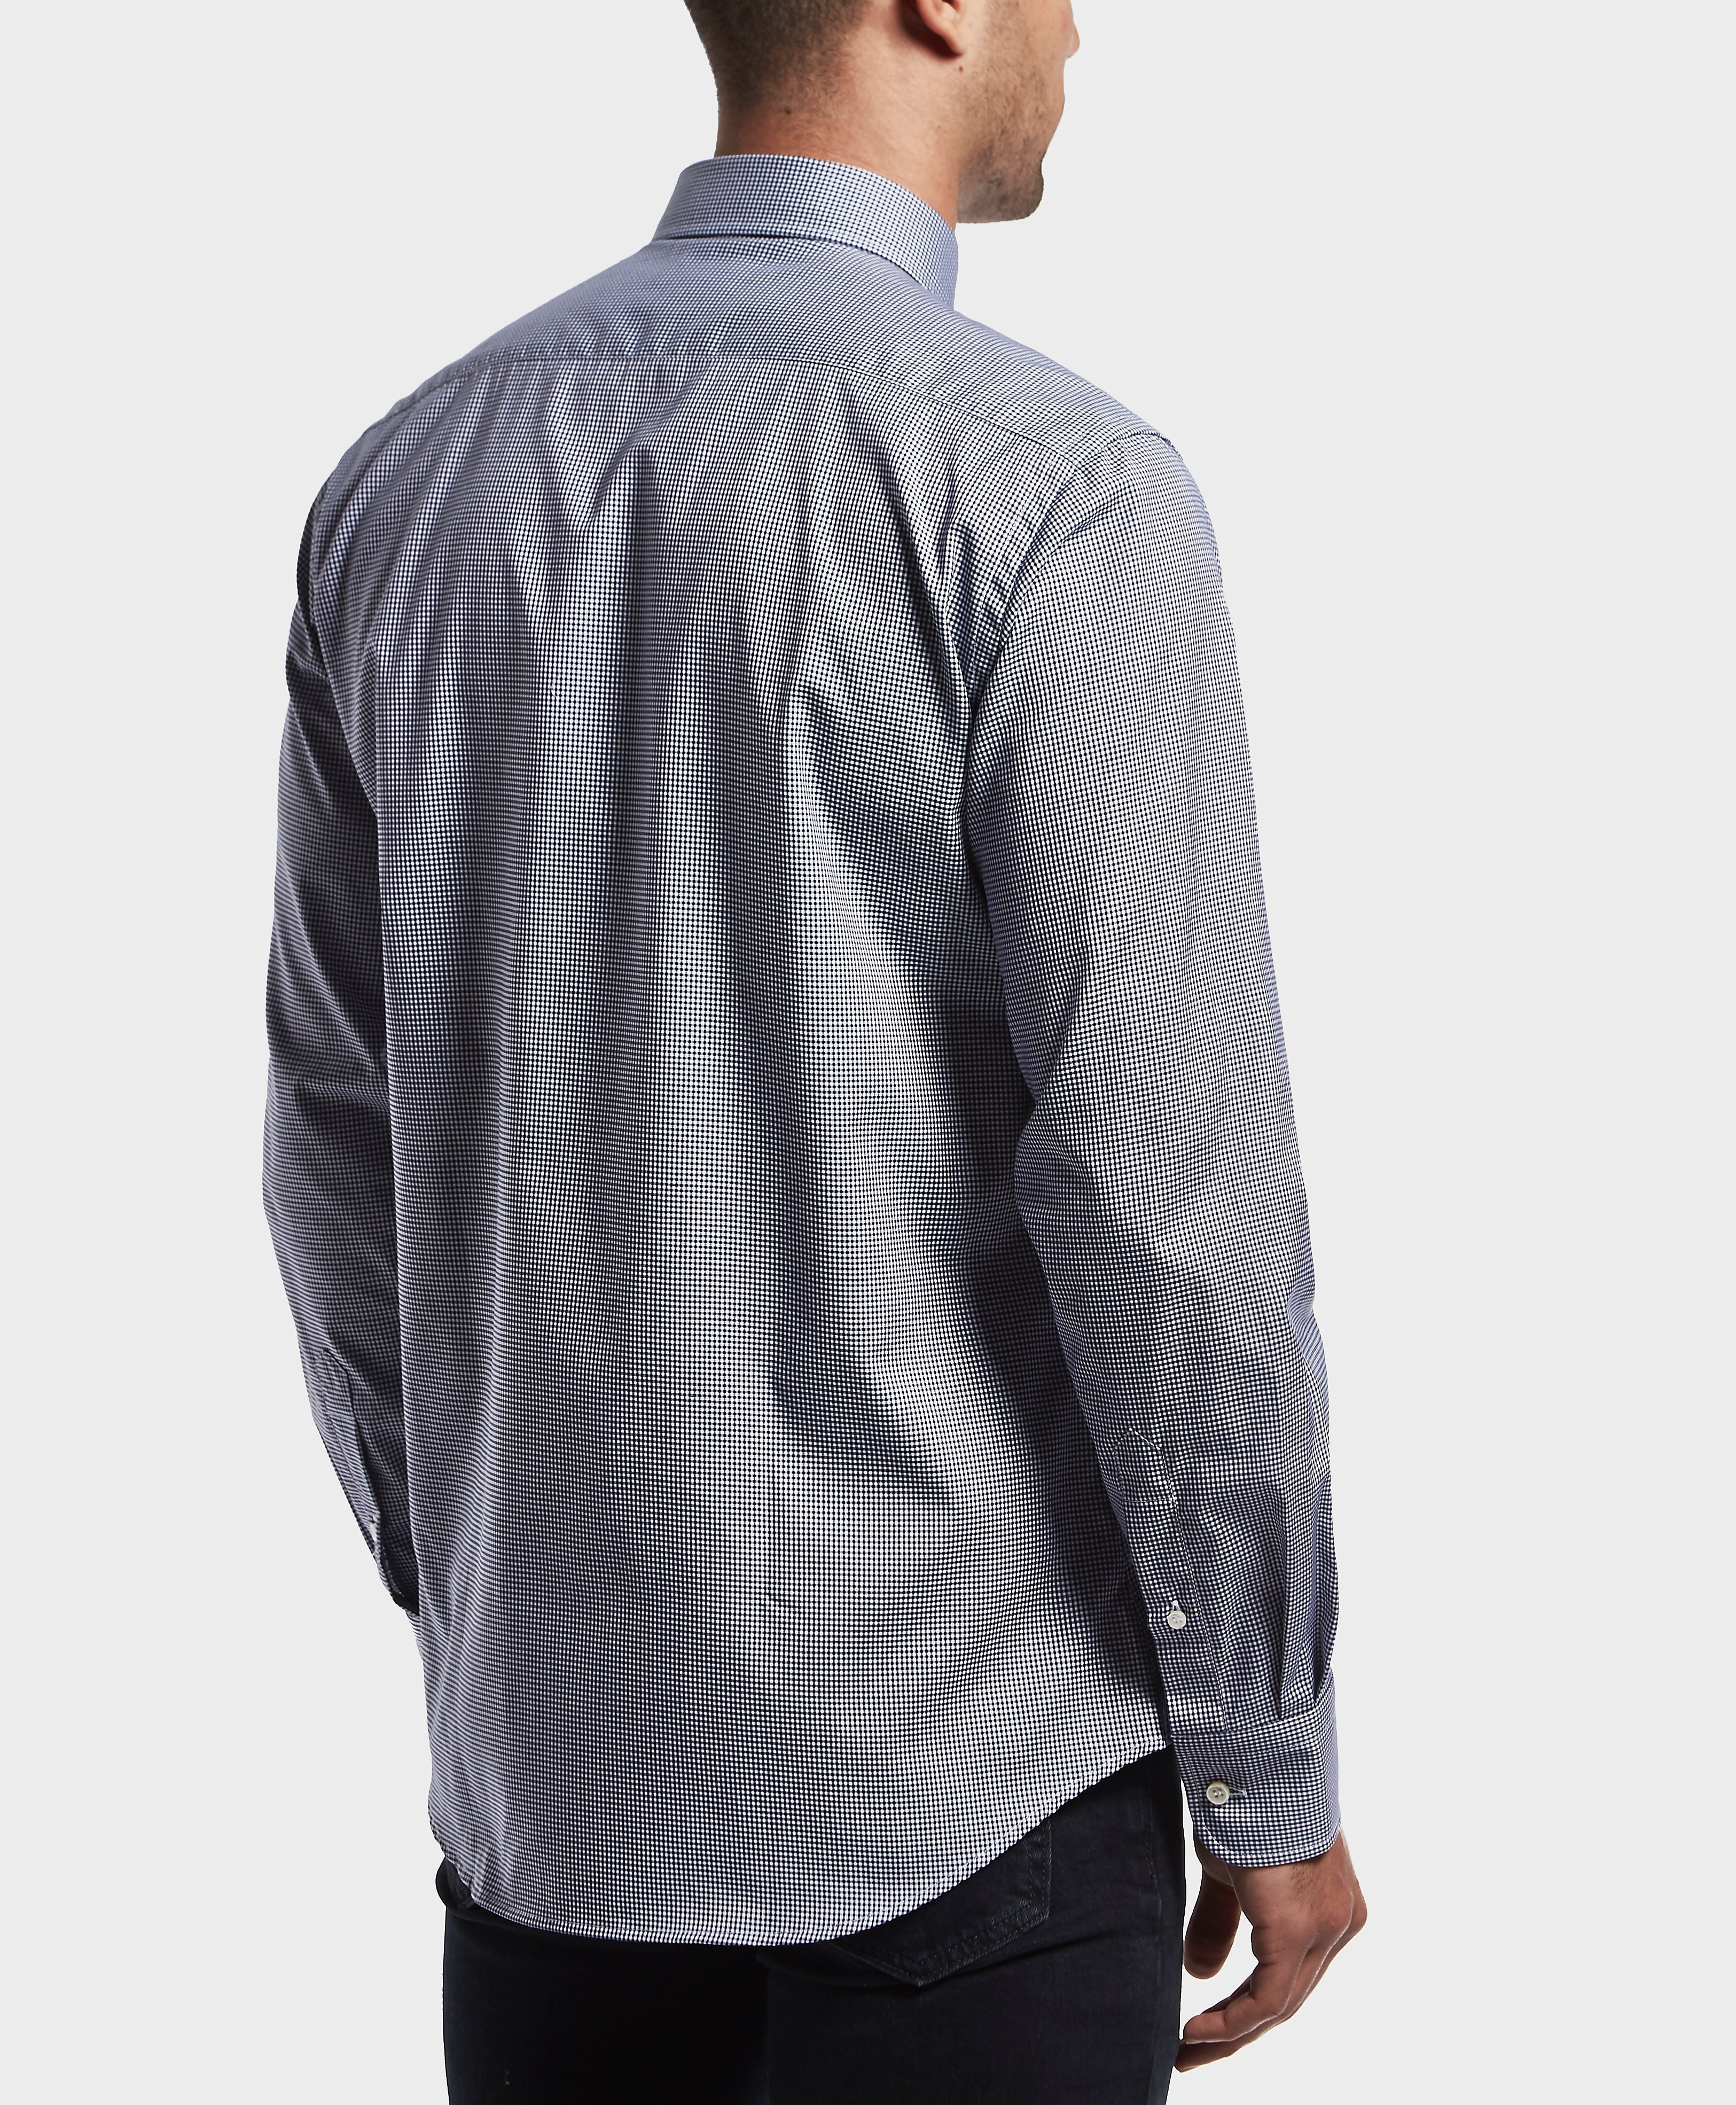 Paul and Shark Long Sleeve Gingham Shirt